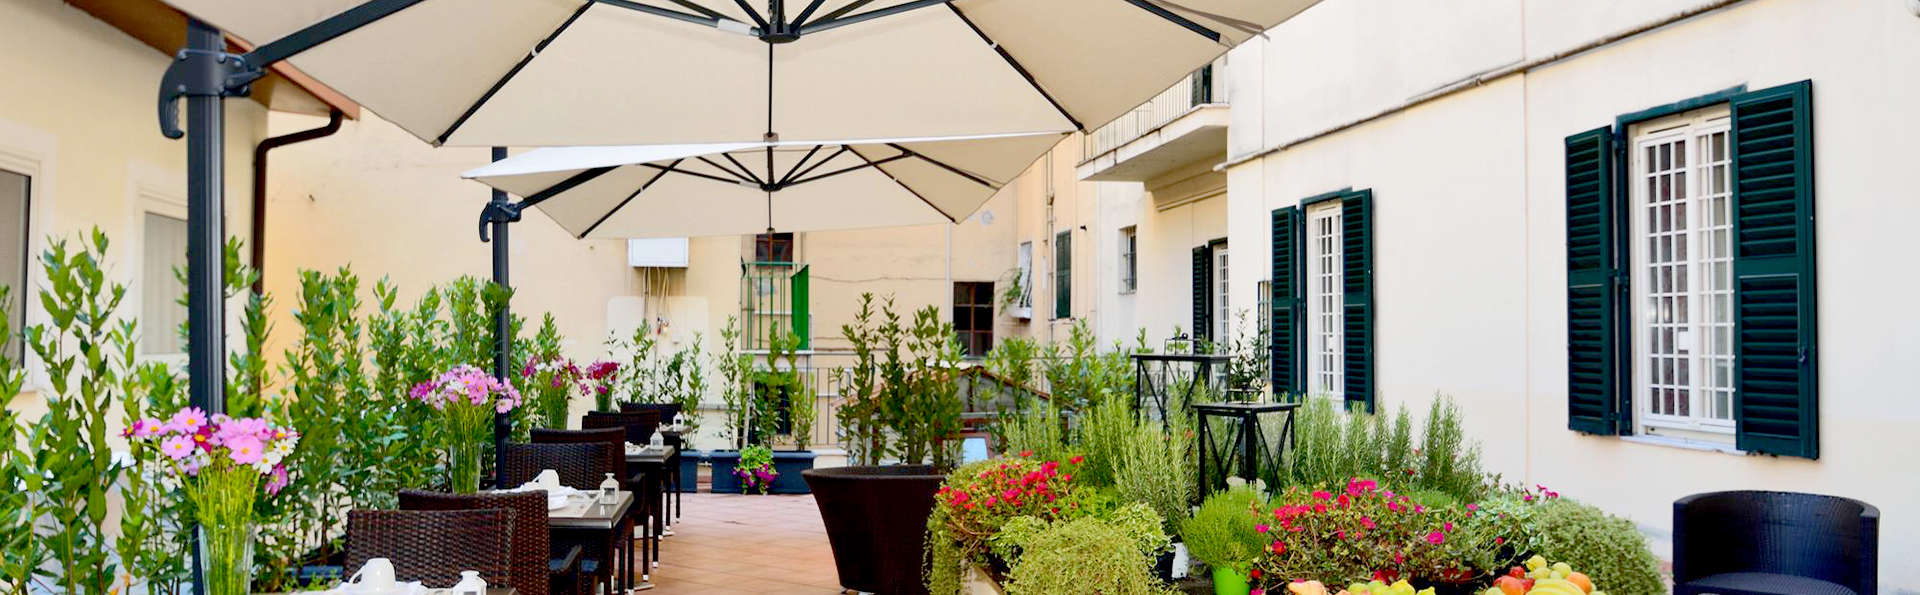 Hotel Apogia Lloyd Roma - Edit_Terrace4.jpg